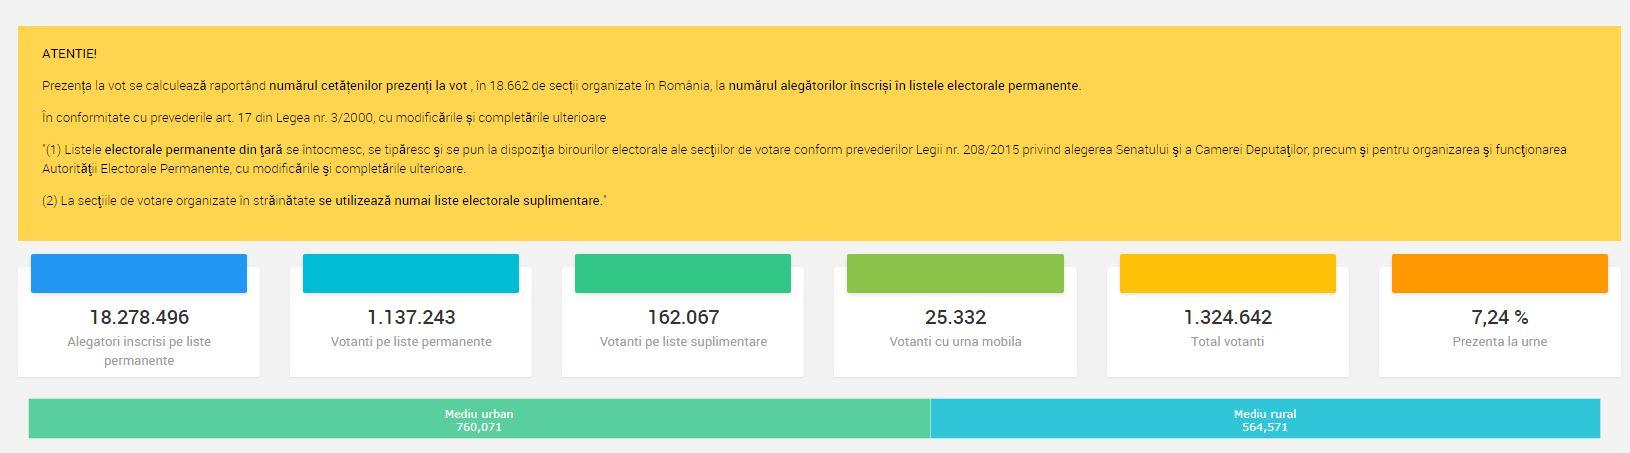 Așa arăta prezența la vot la ora 10.00, potrivit datelor BEC